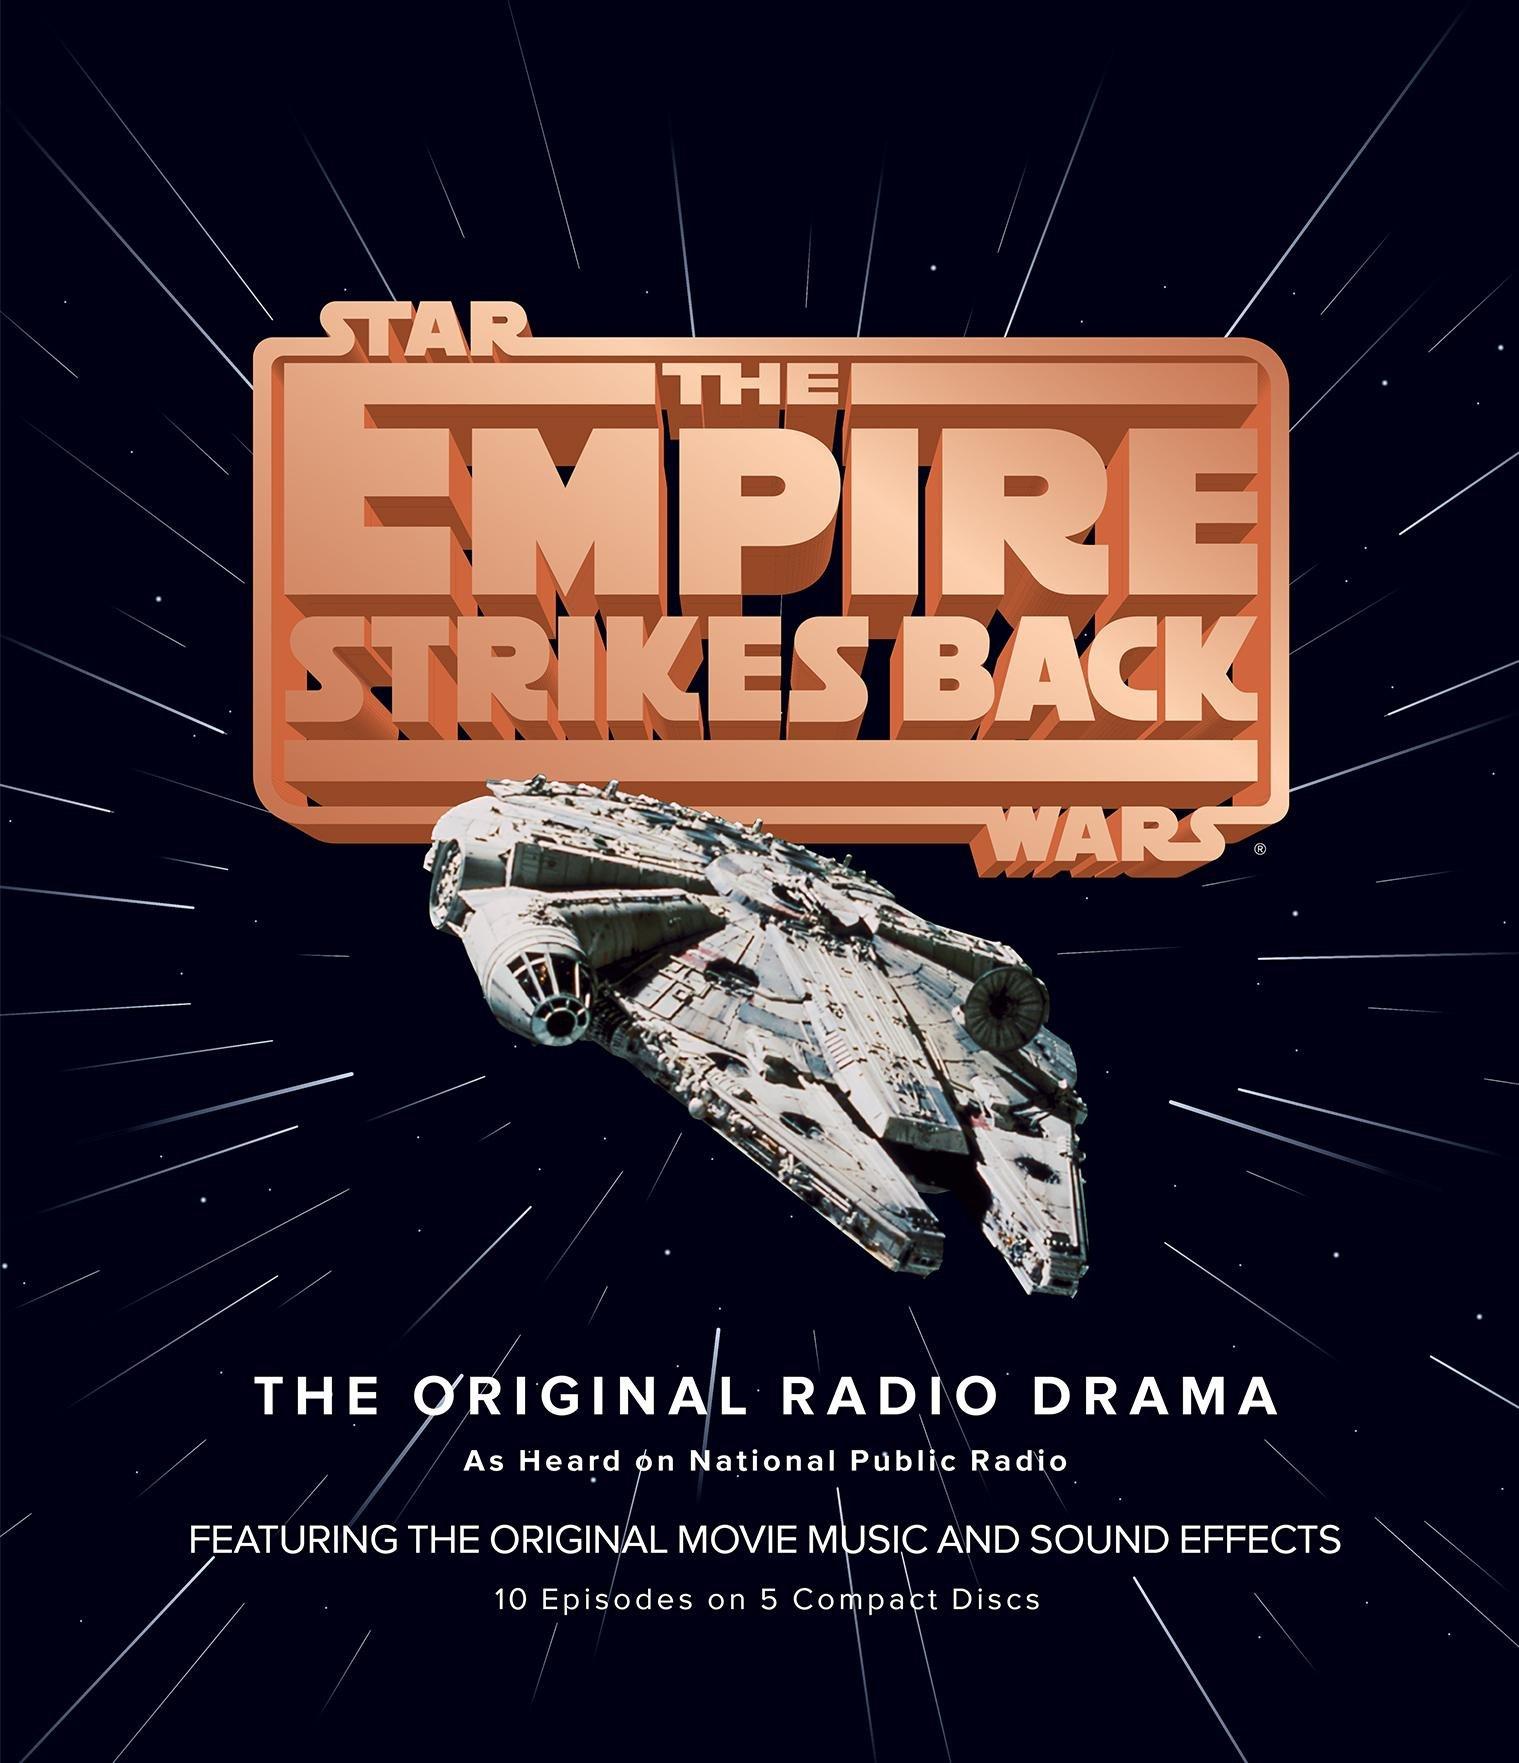 George Lucas's The Empire Strikes Back: The Original Radio Drama